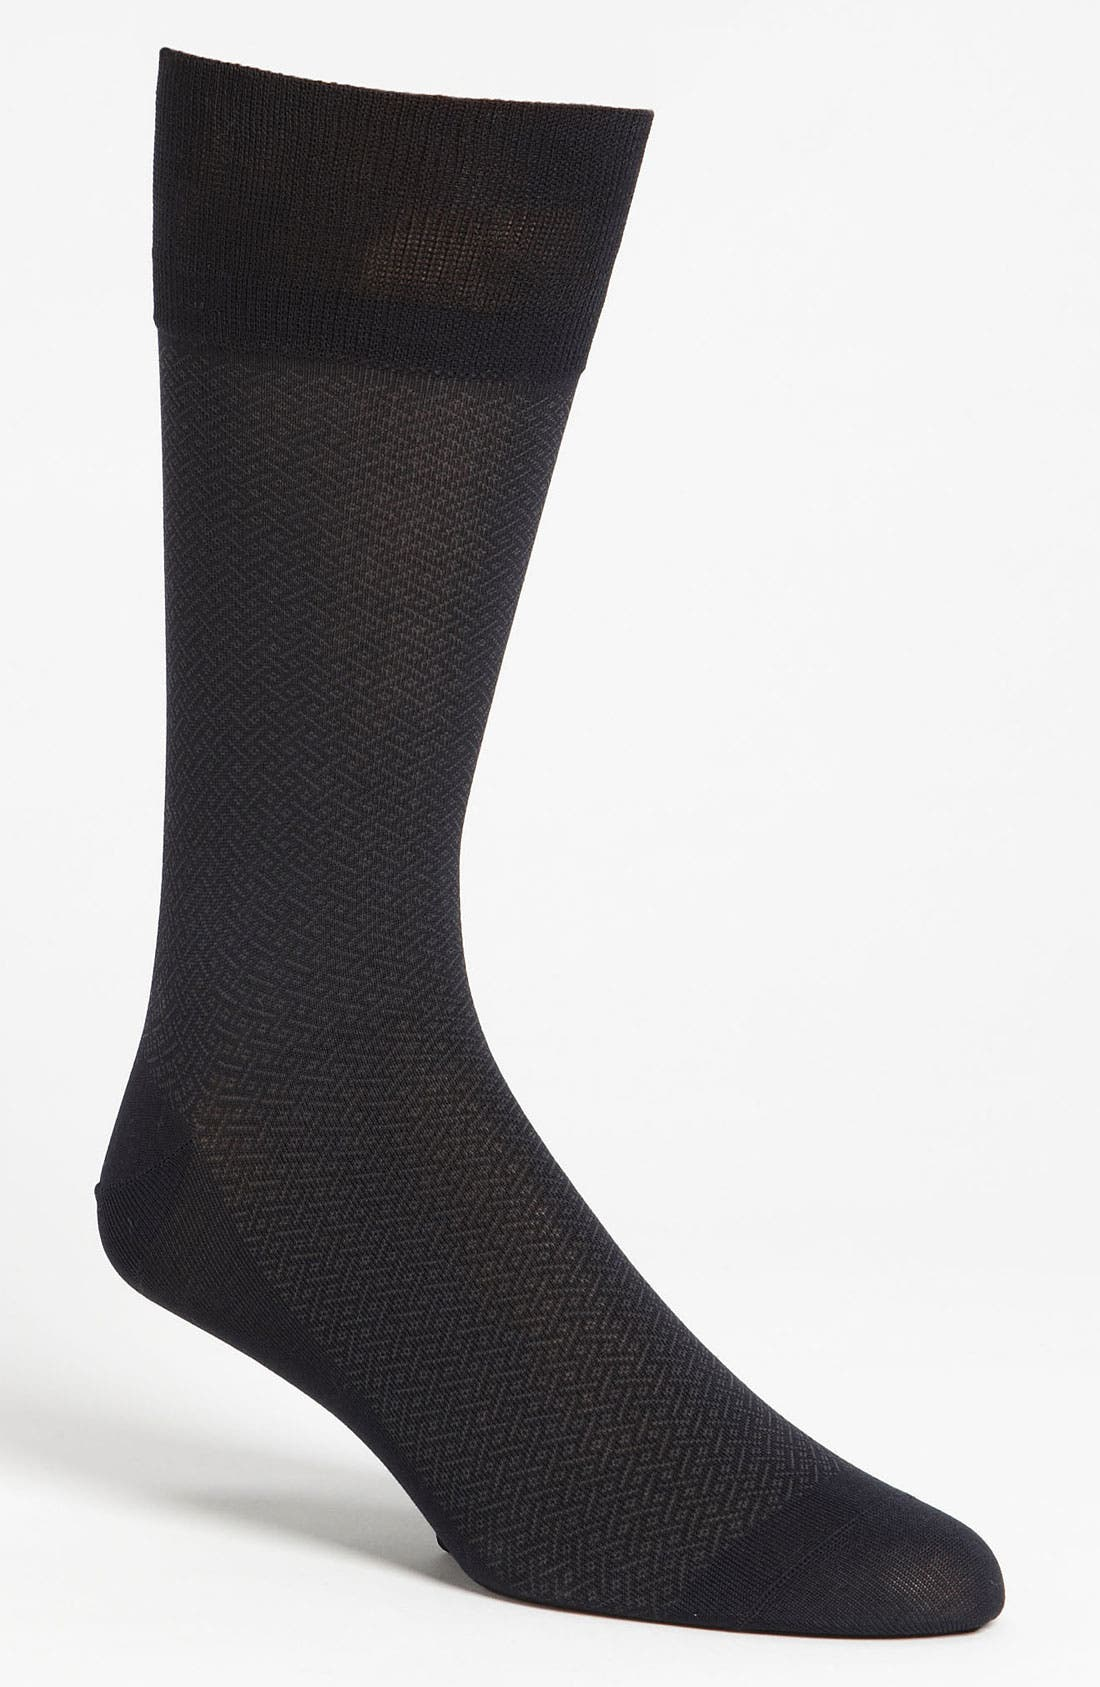 Main Image - John W. Nordstrom® Basket Weave Socks